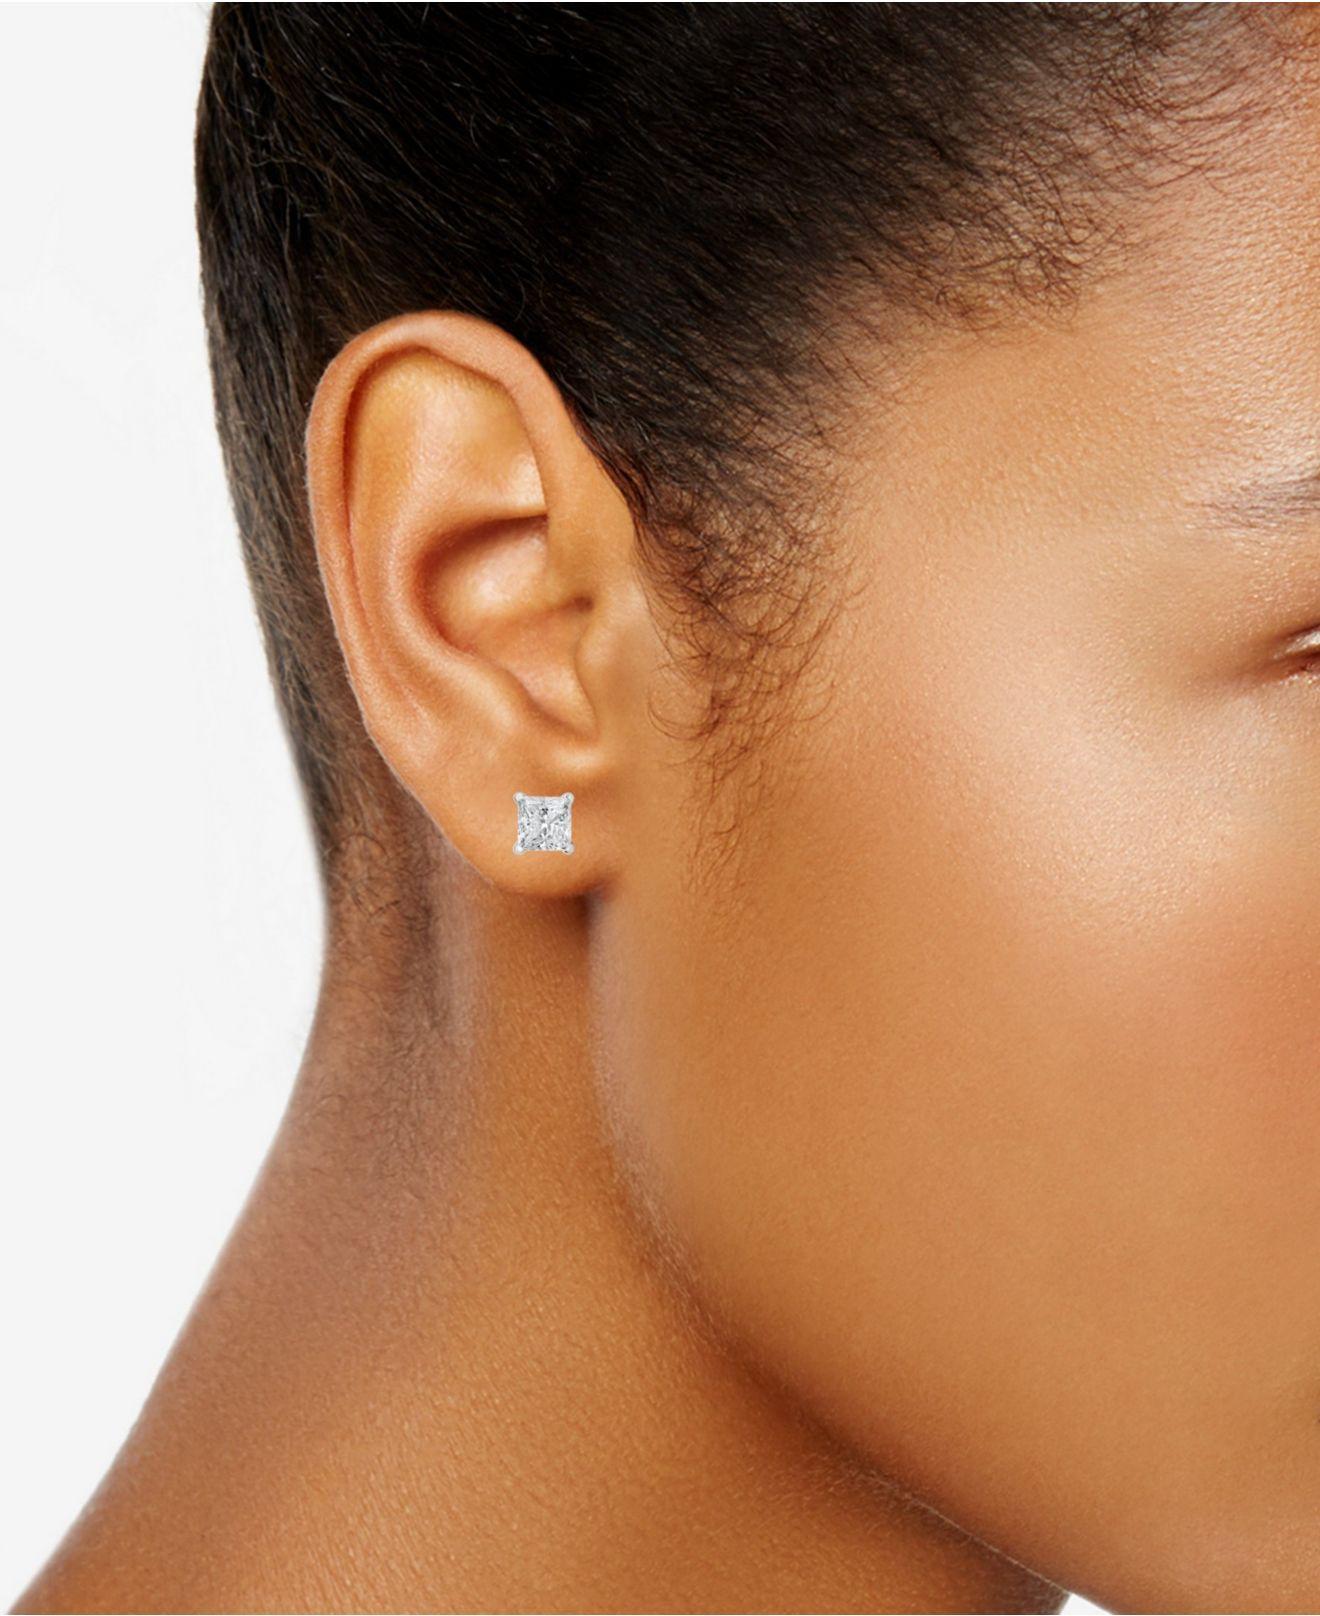 Certified Princess Cut Diamond Stud Earrings 1 Ct T W In 14k White Gold Or Yellow